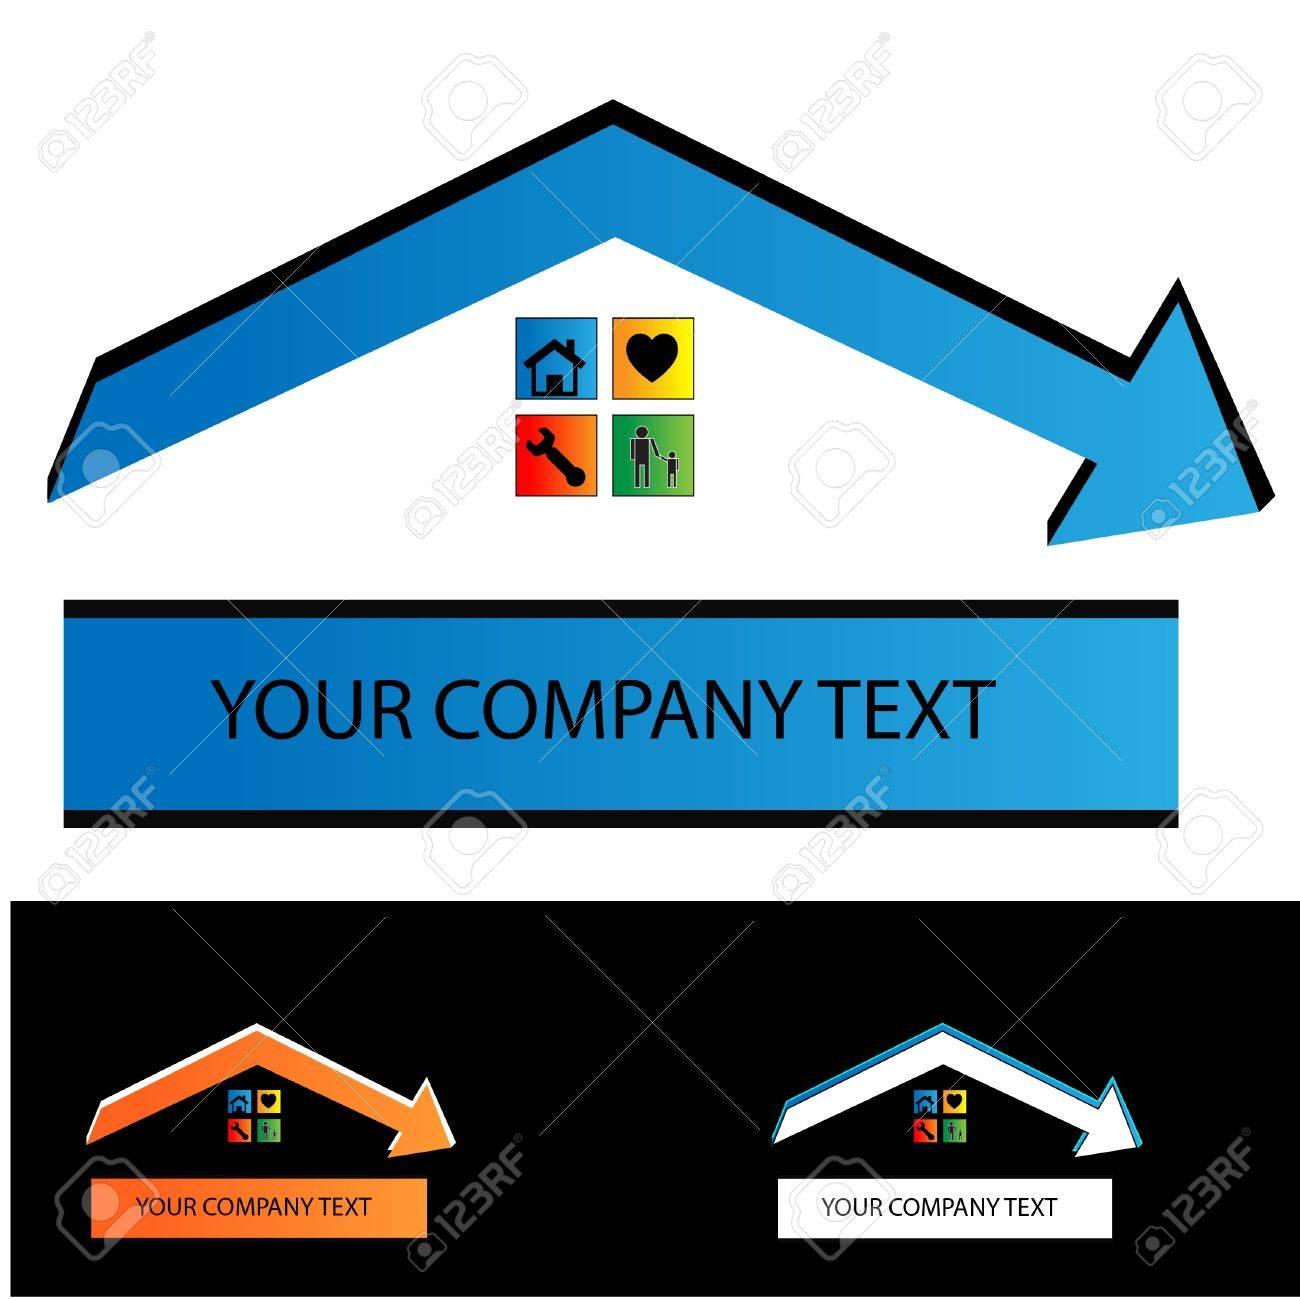 Immobilienvertrag Gebäude Contruction Logo Lizenzfrei Nutzbare